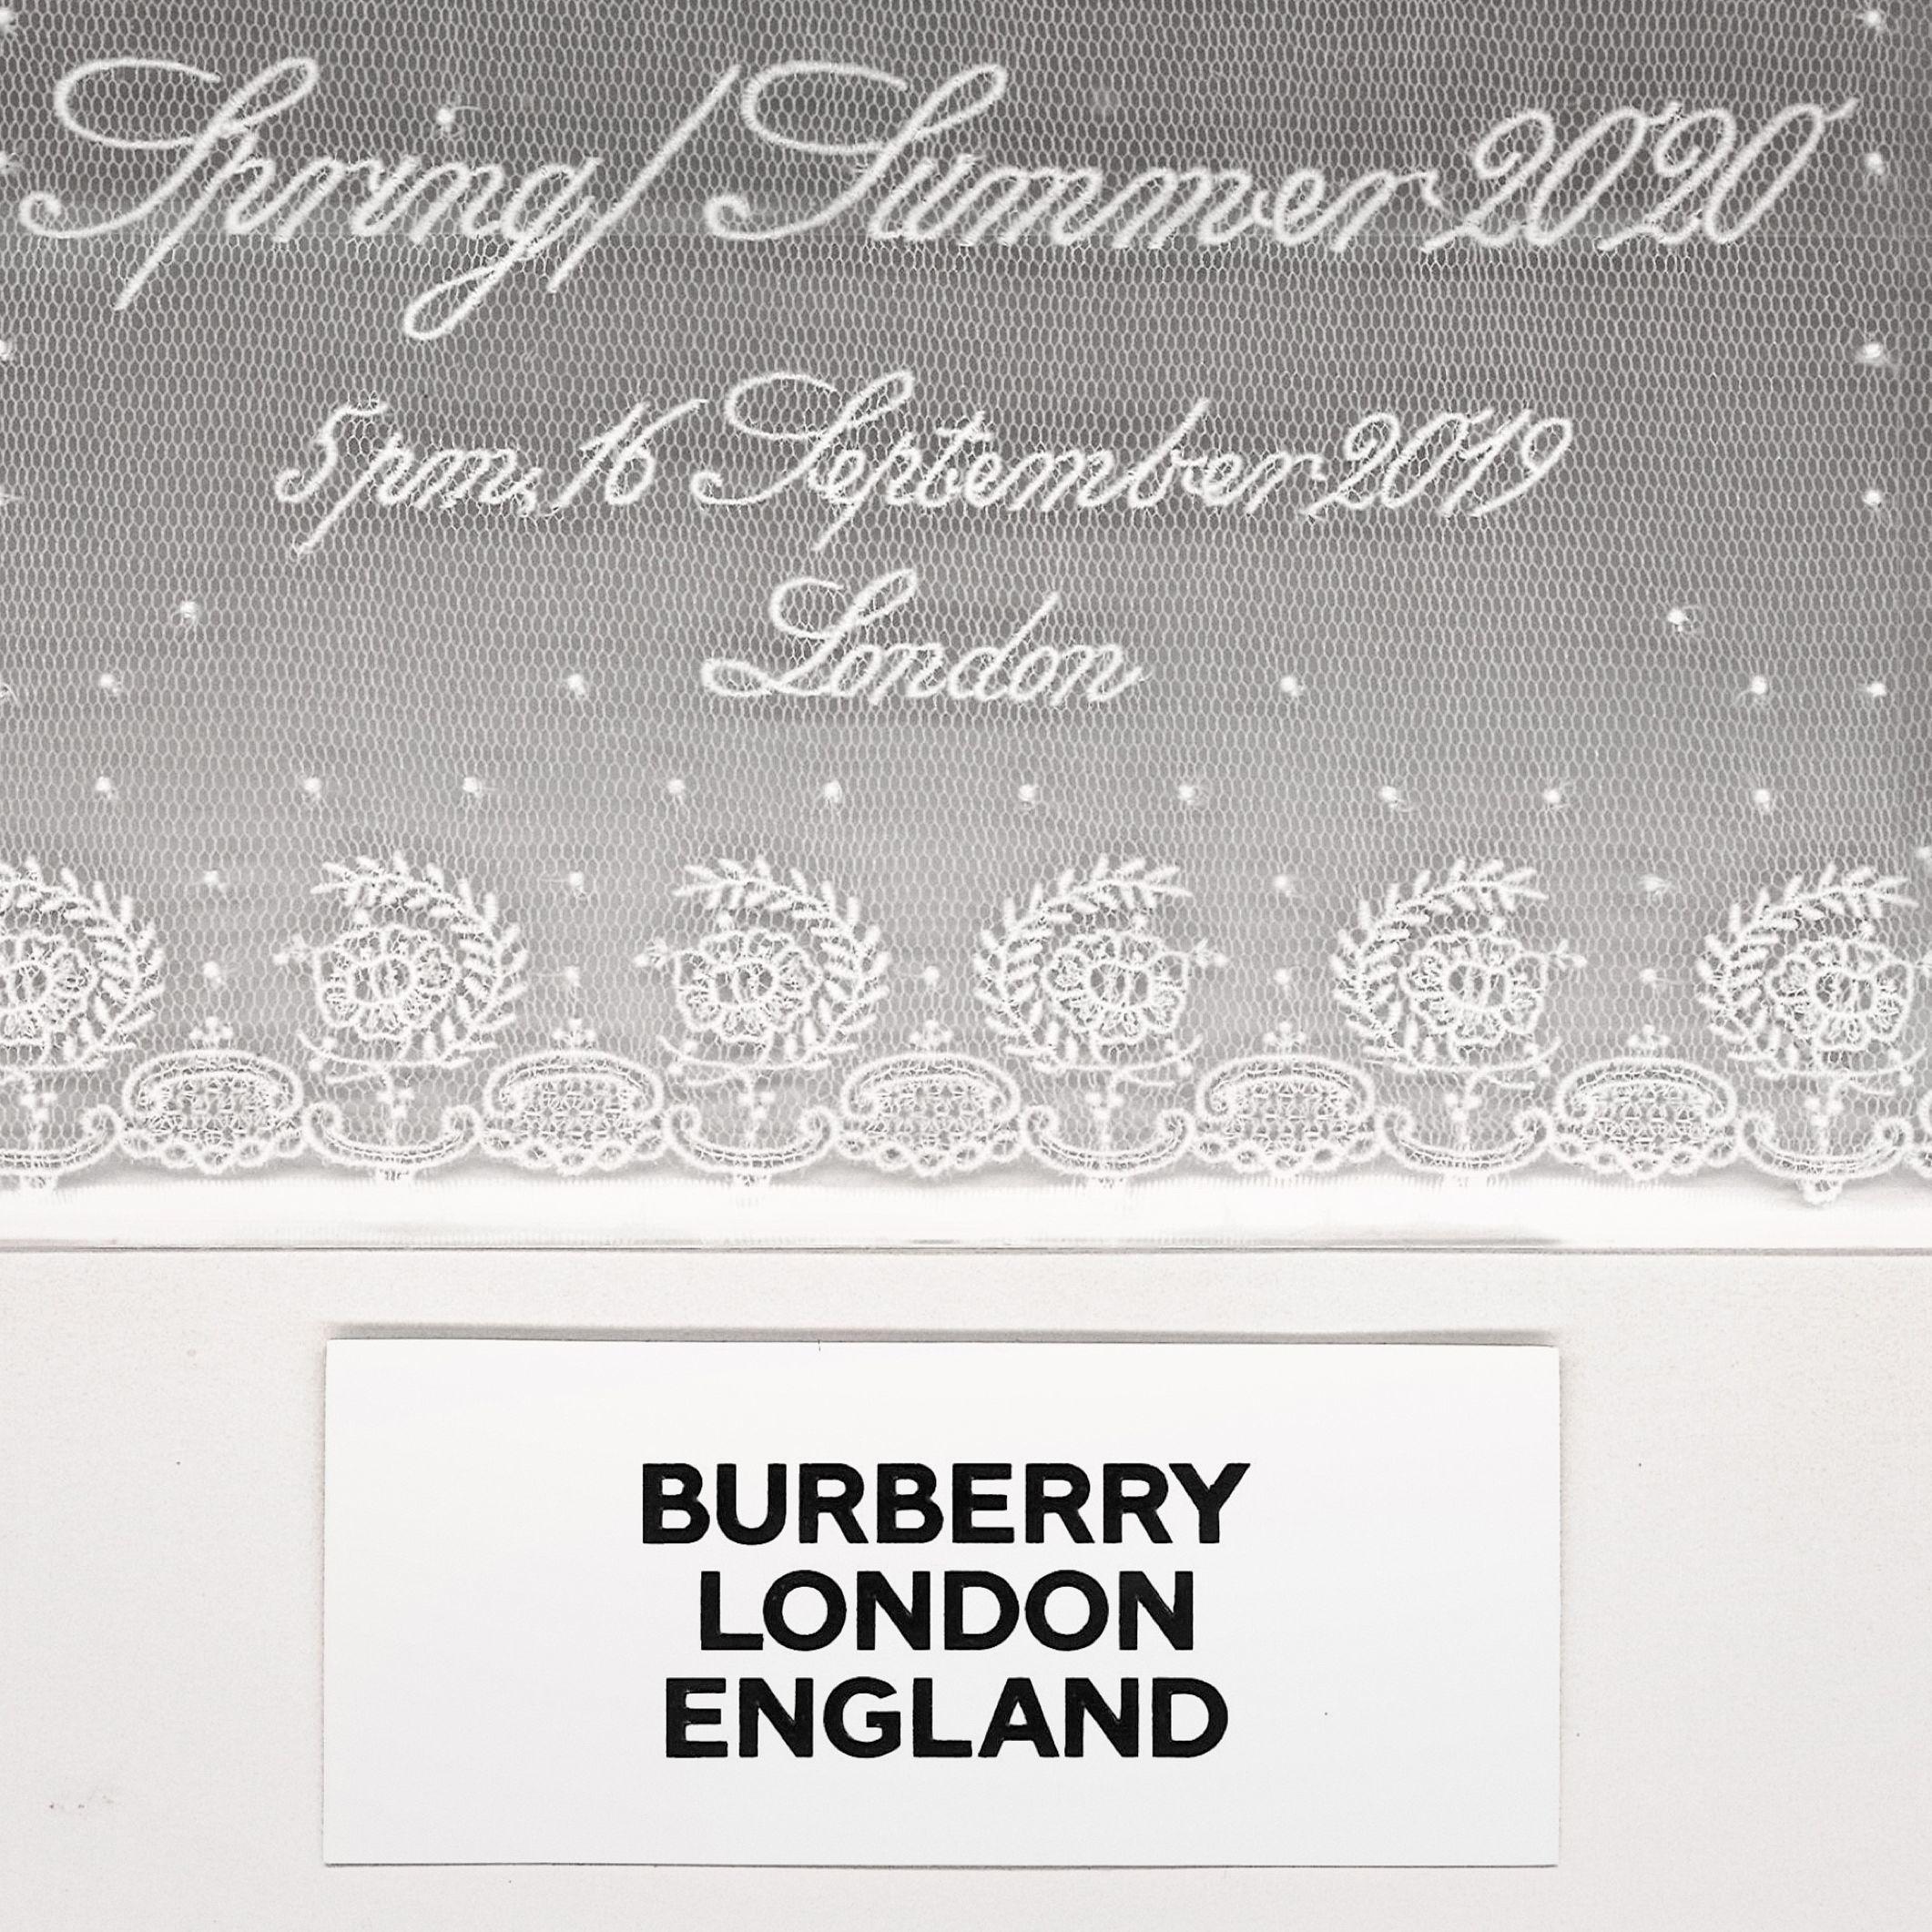 BURBERRY SS20 春夏時裝大秀